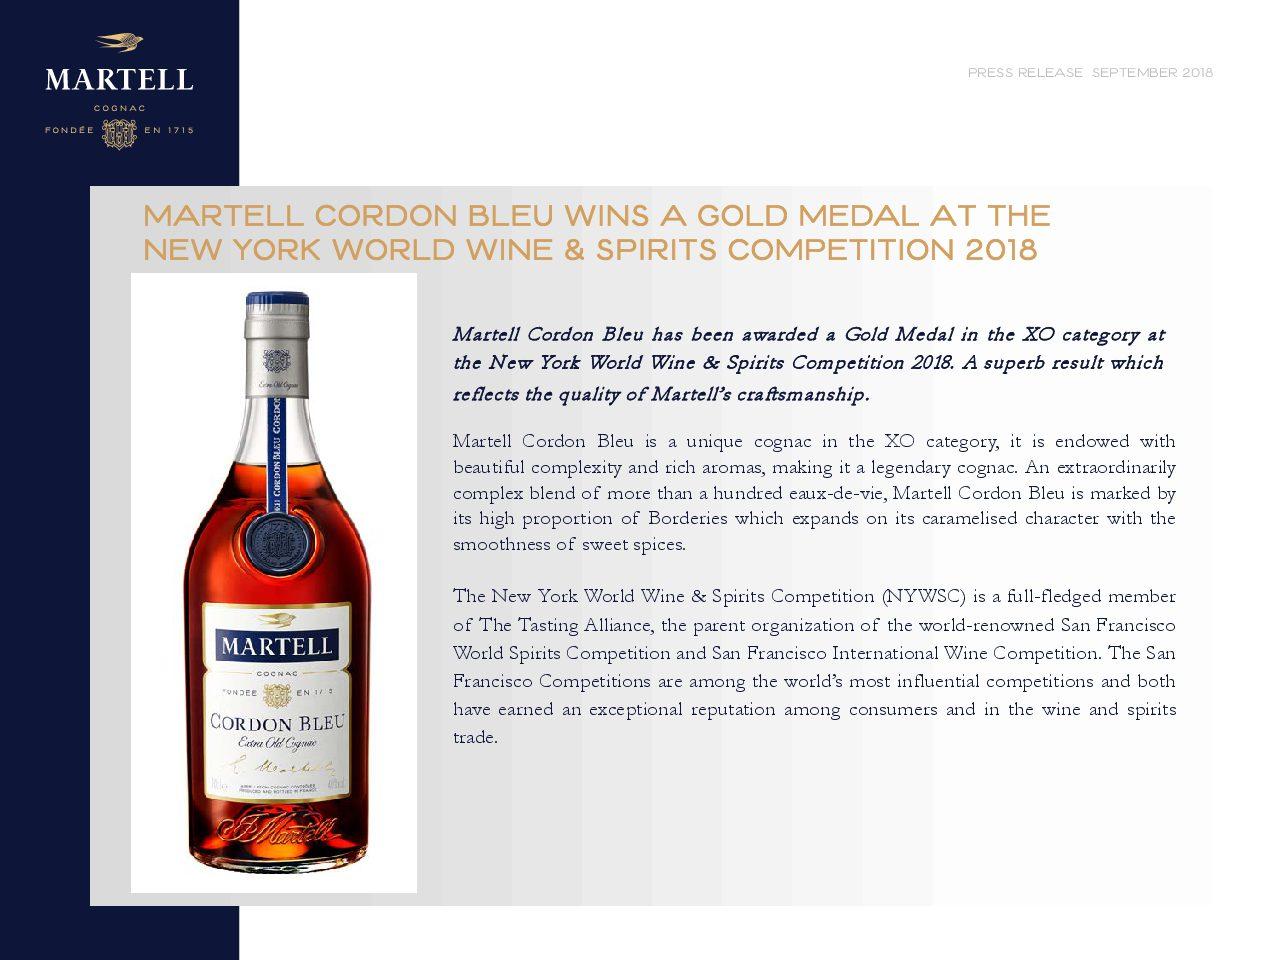 Press Release Martell Cordon Bleu Wins Gold Medal at the NYWSC